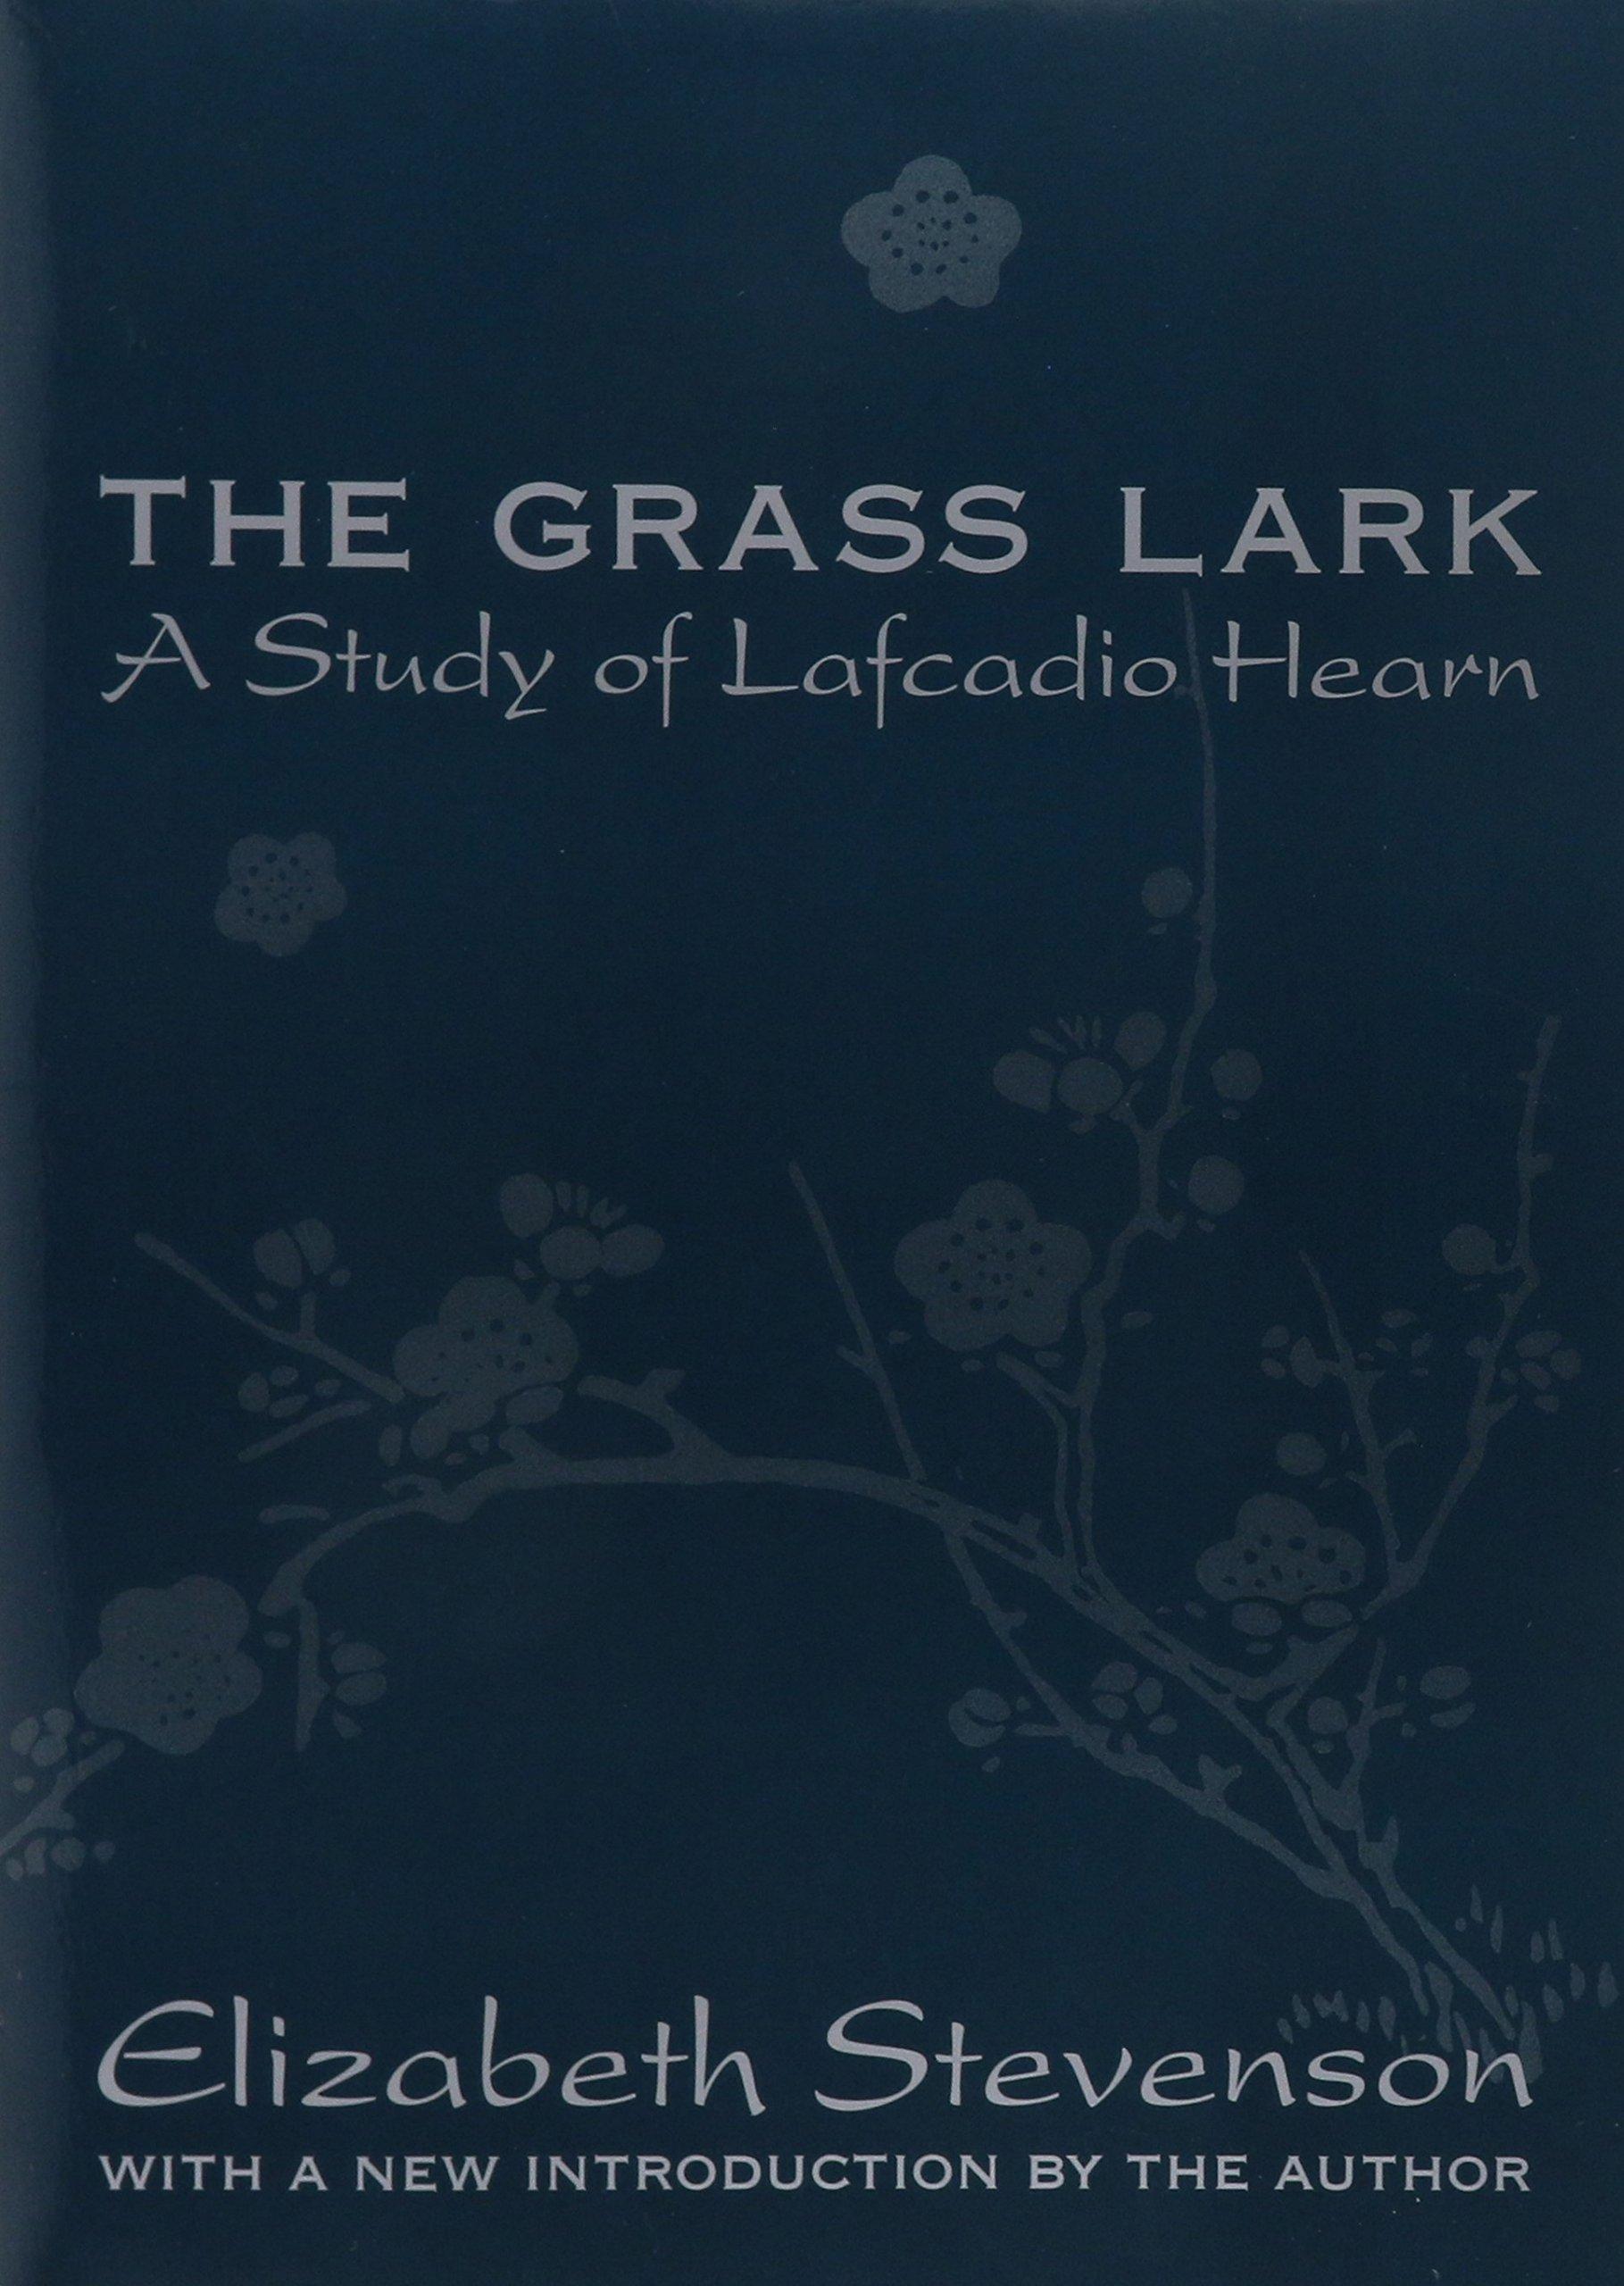 the-grass-lark-a-study-of-lafcadio-hearn